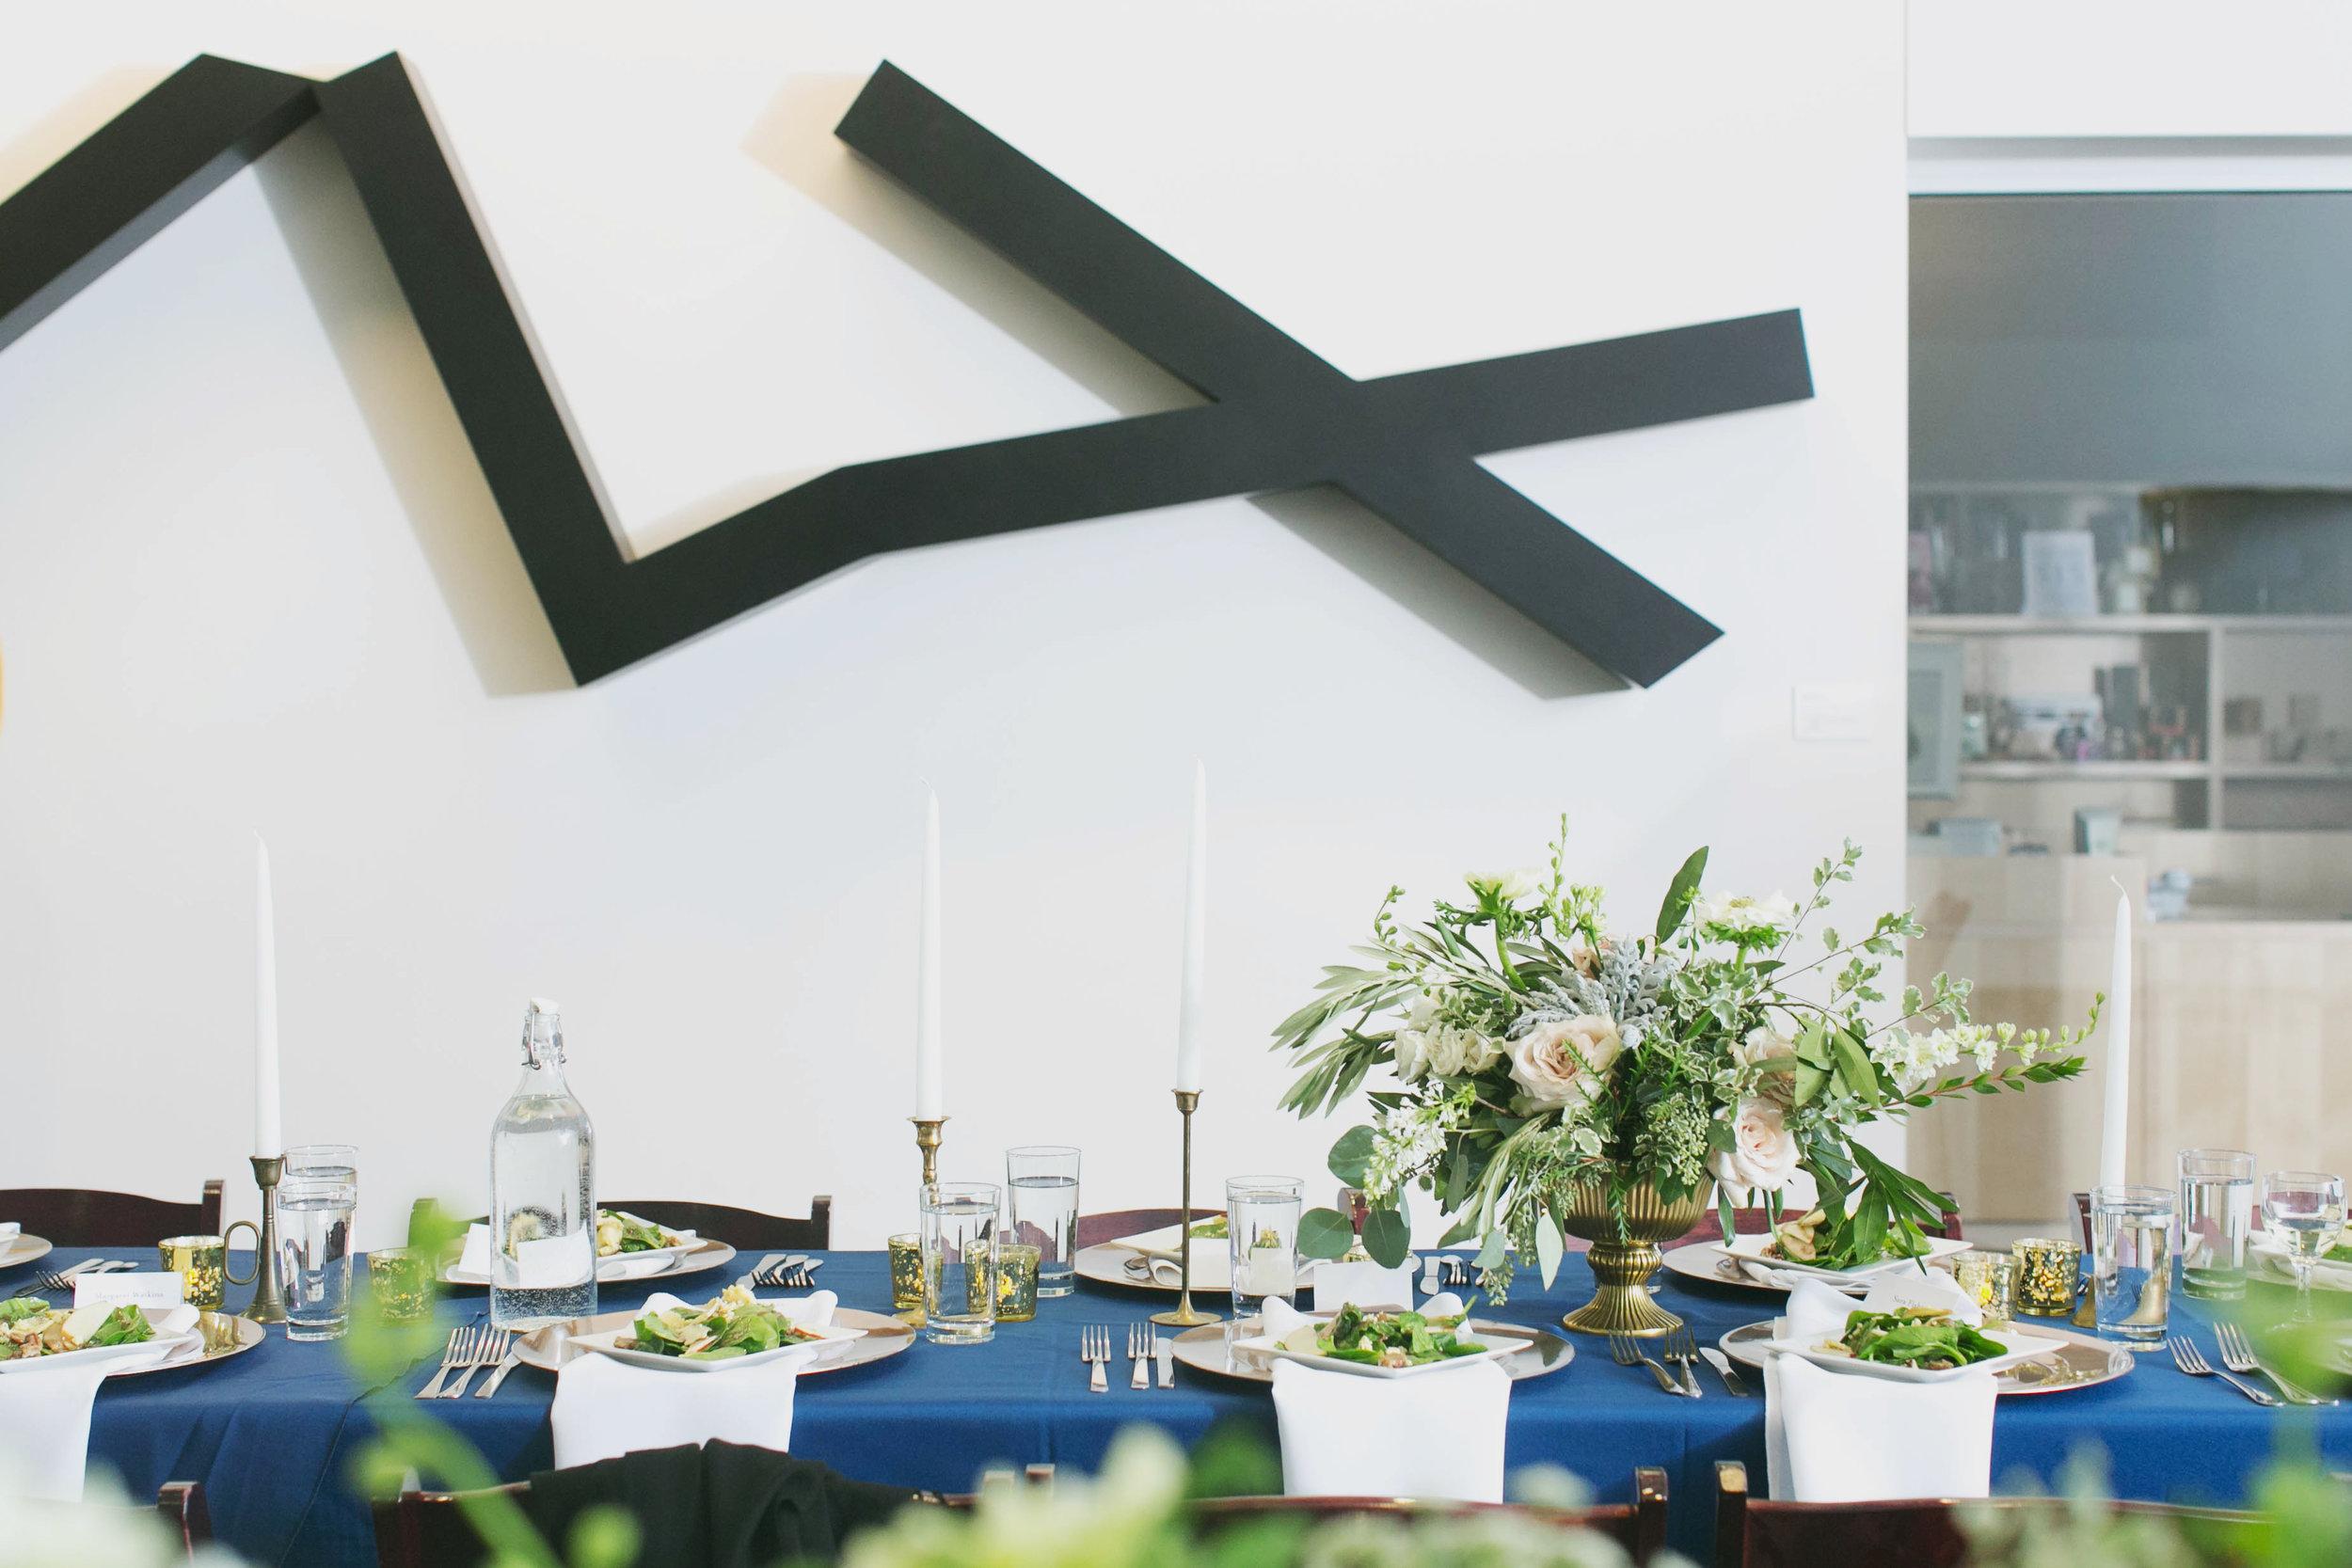 Simply-Charming-Socials_Atlanta-Wedding-Planner_Our-Labor-Of-Love_Emily-and-Jon_24.jpg